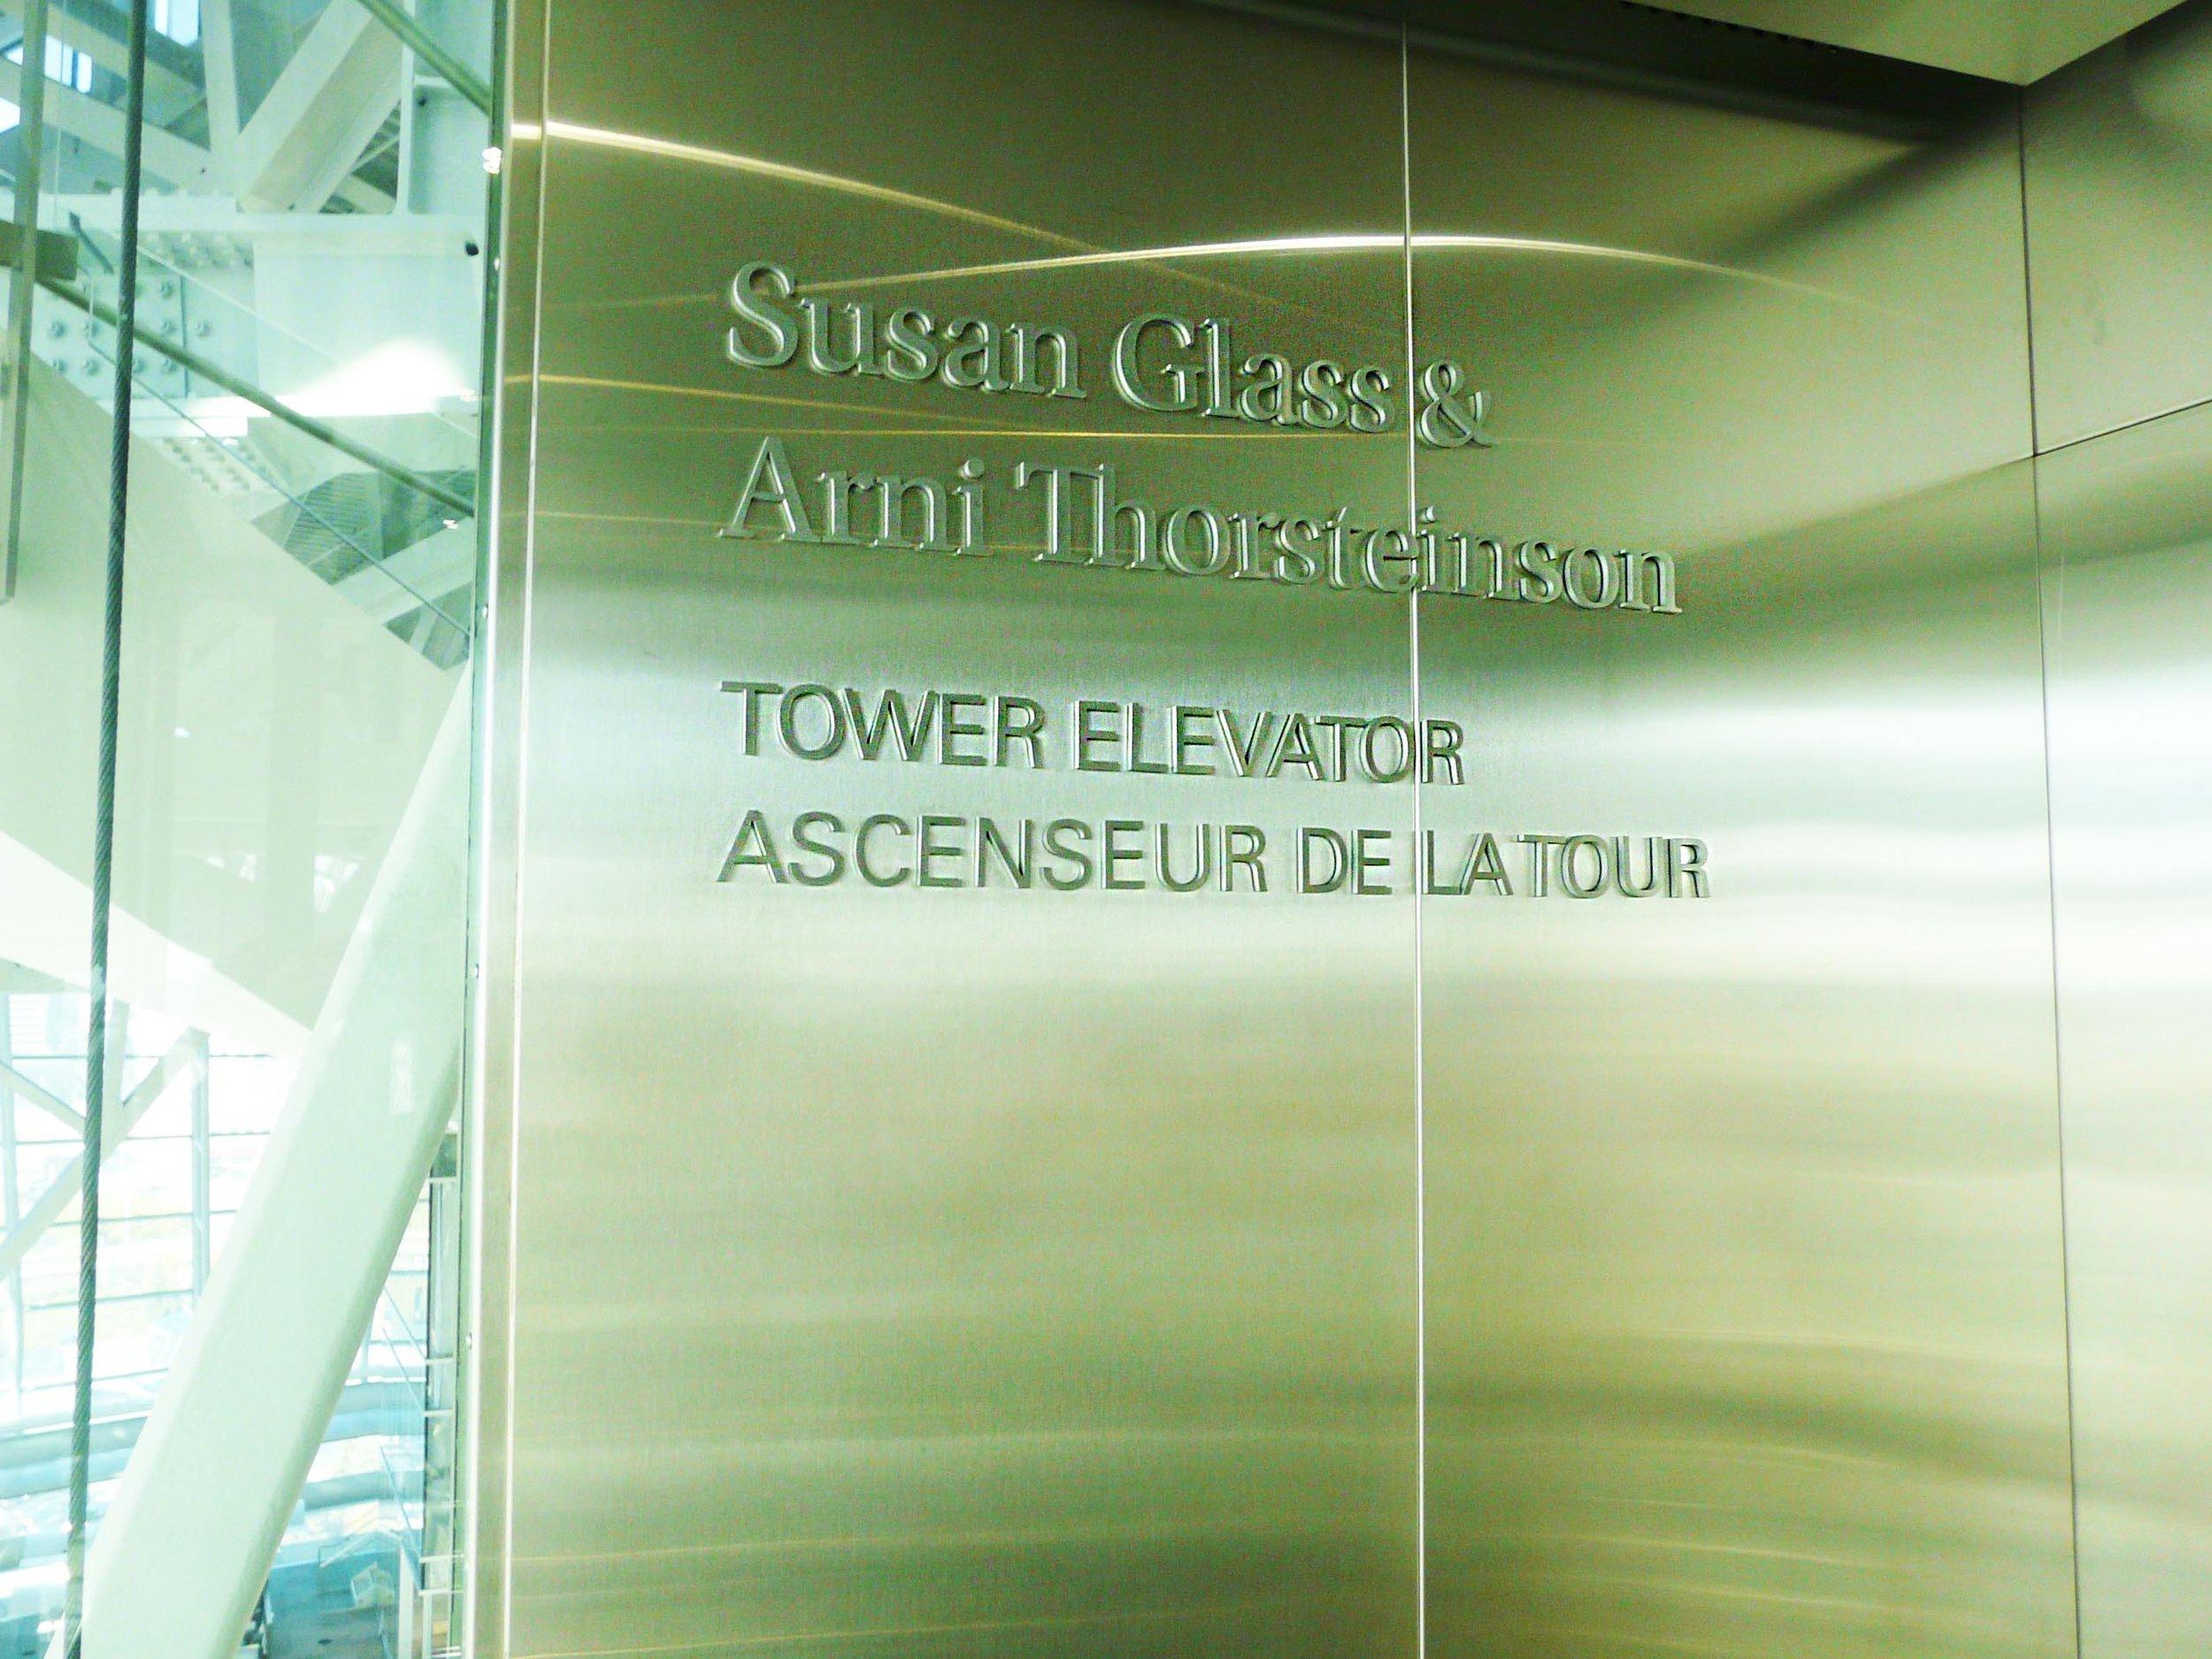 museum Elevator sign.jpg